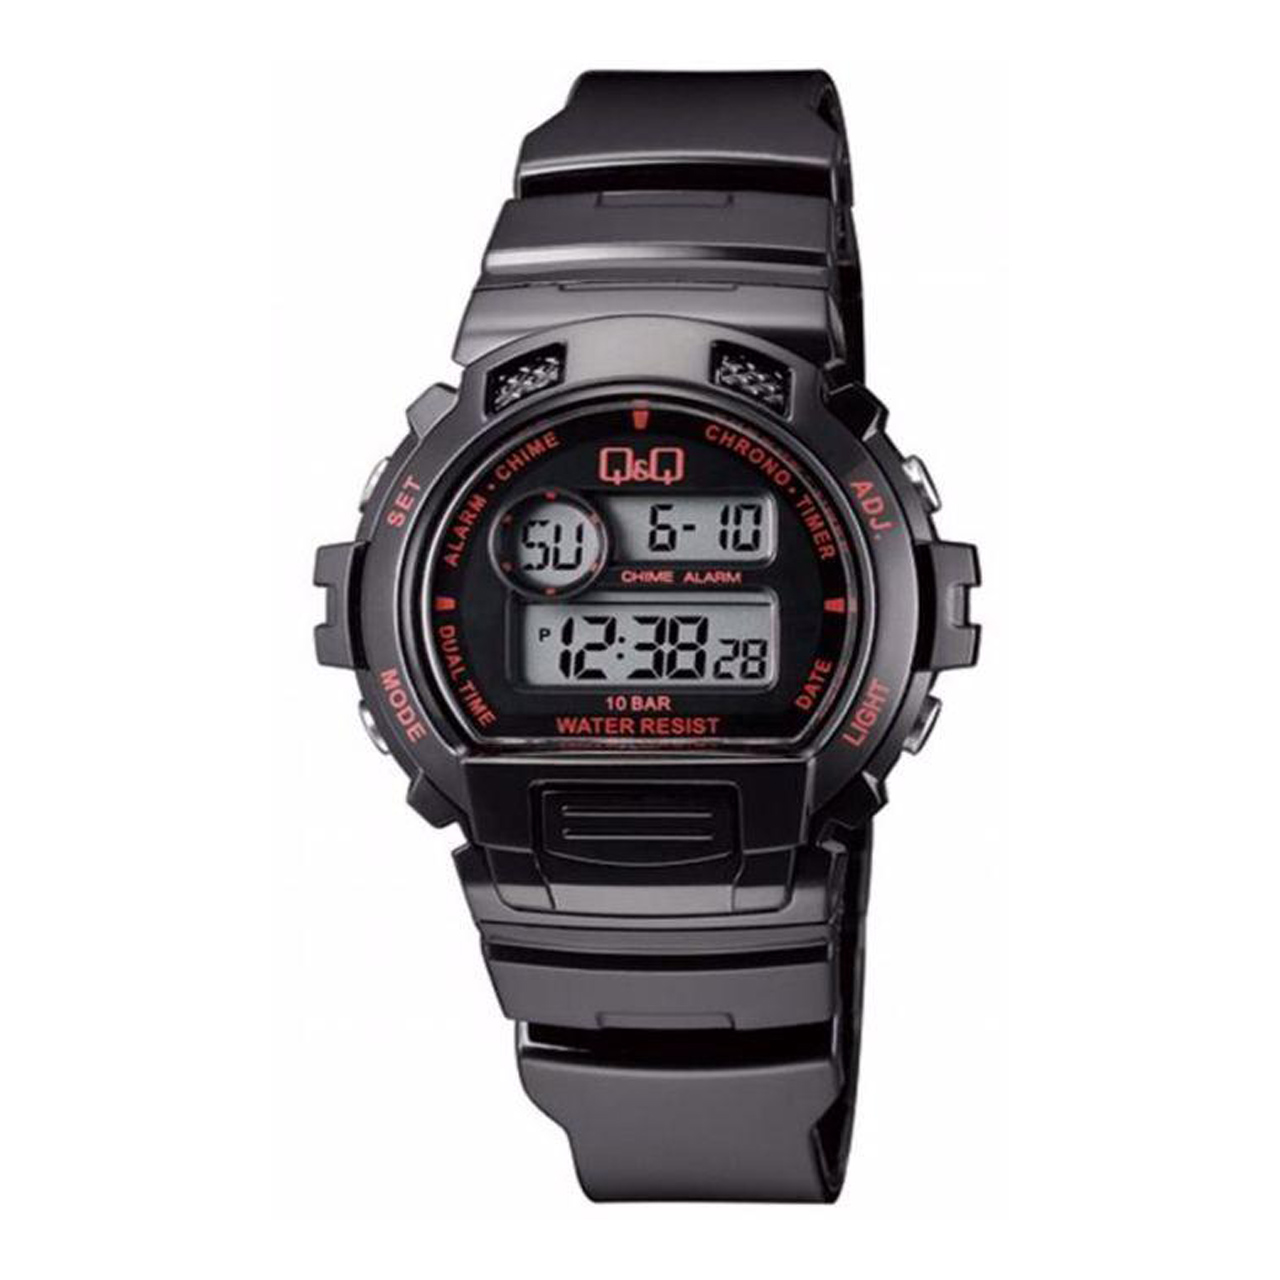 ساعت مچی دیجیتال زنانه کیو اند کیو مدل M153J001Y